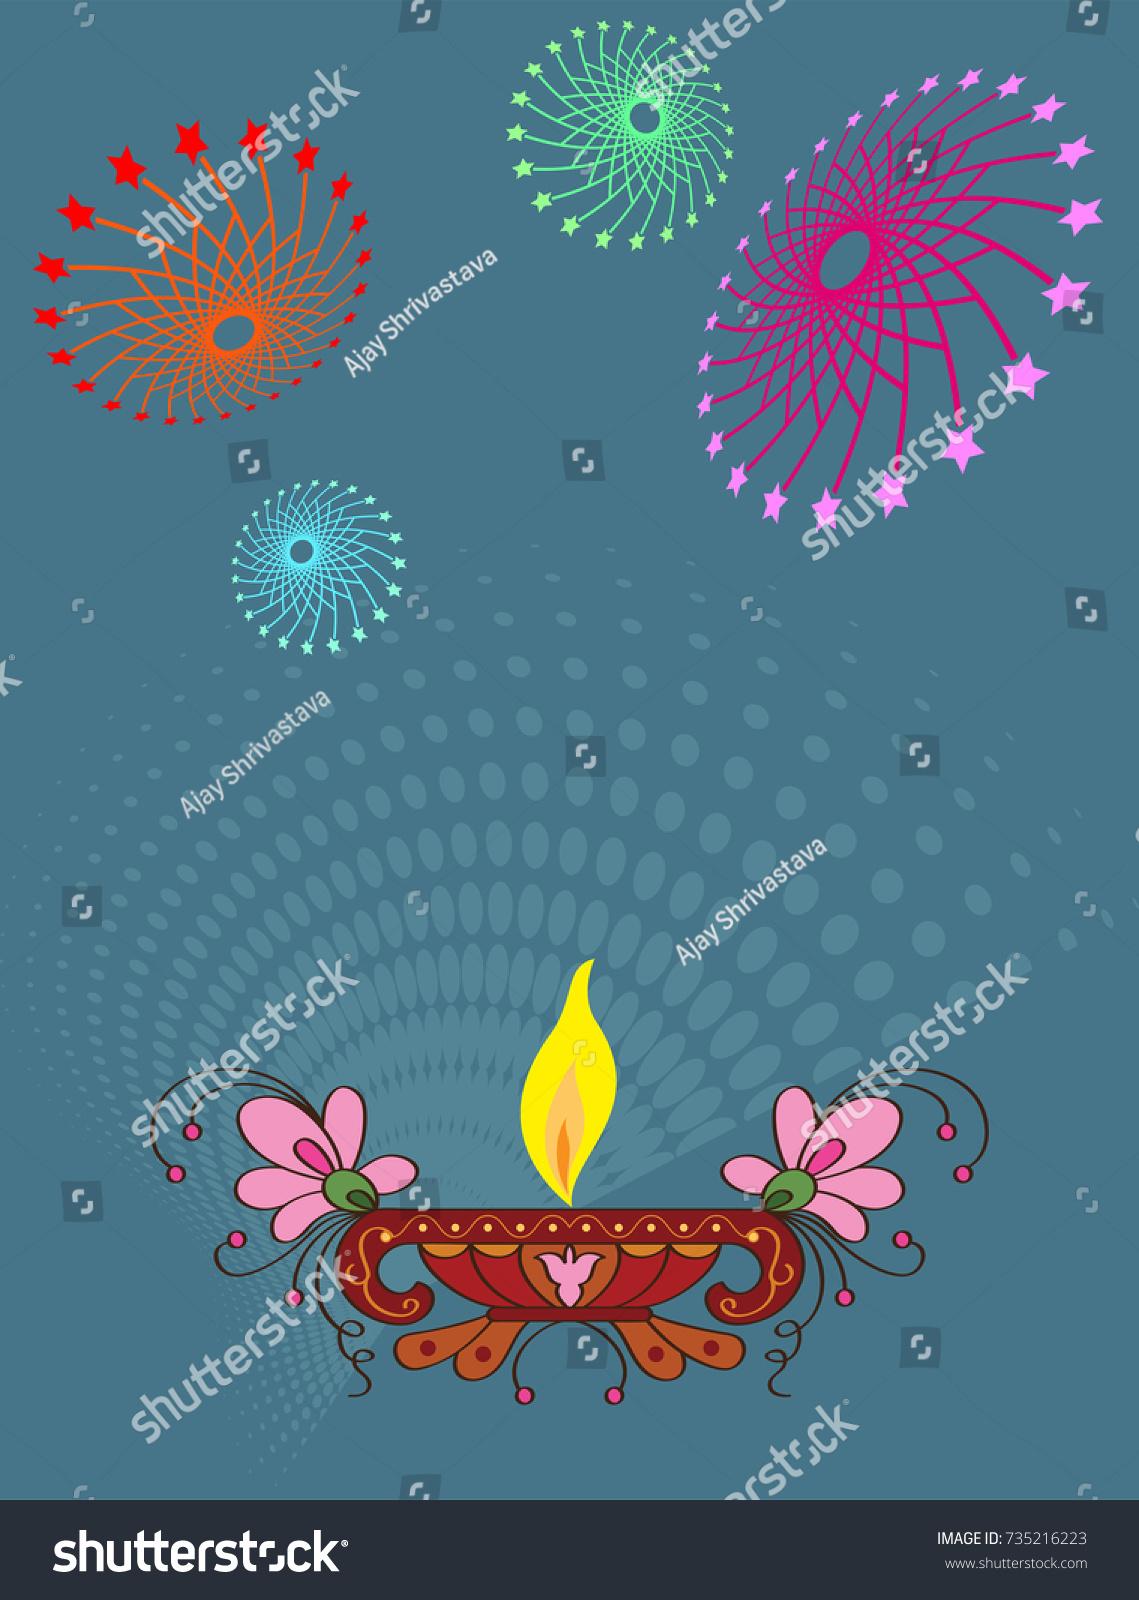 Diwali greeting design vector art stock vector 735216223 shutterstock diwali greeting design vector art m4hsunfo